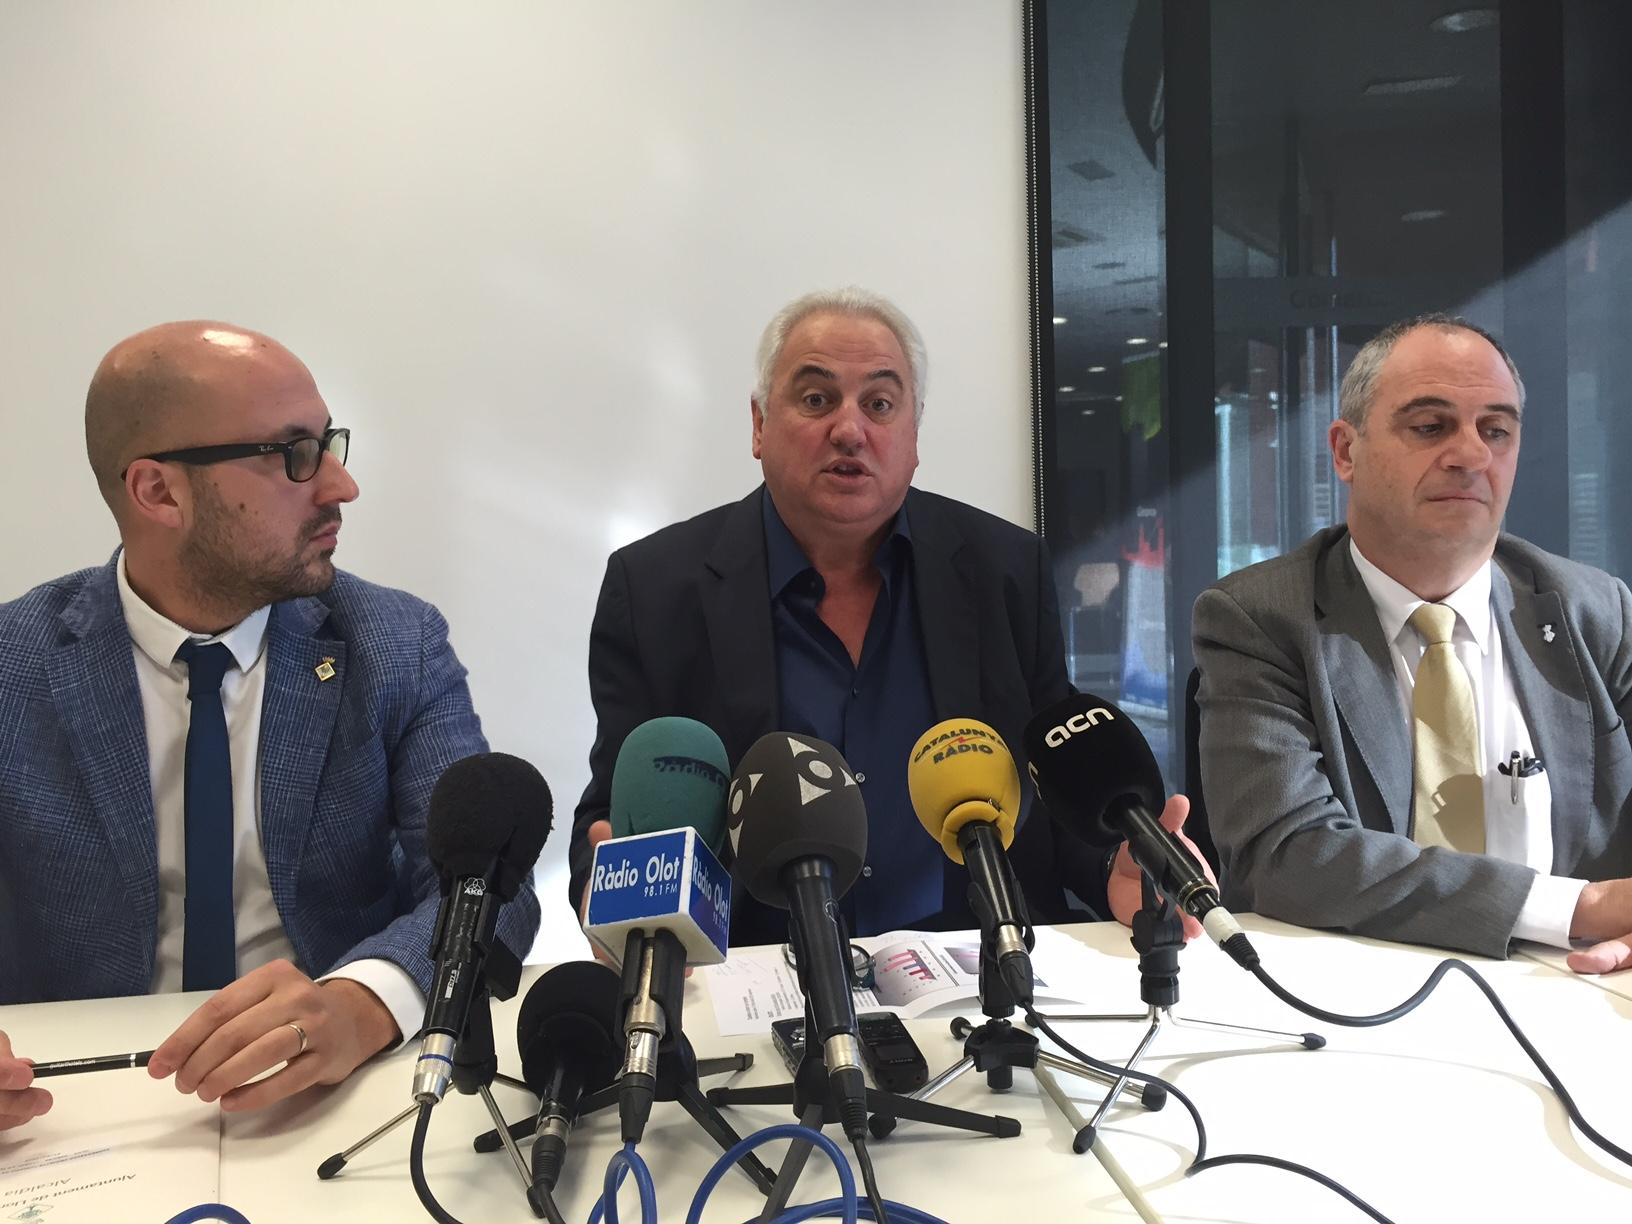 Jaume Dulsat, Mia Corominas i Albert Ballesta 2 (Jordi Altesa)